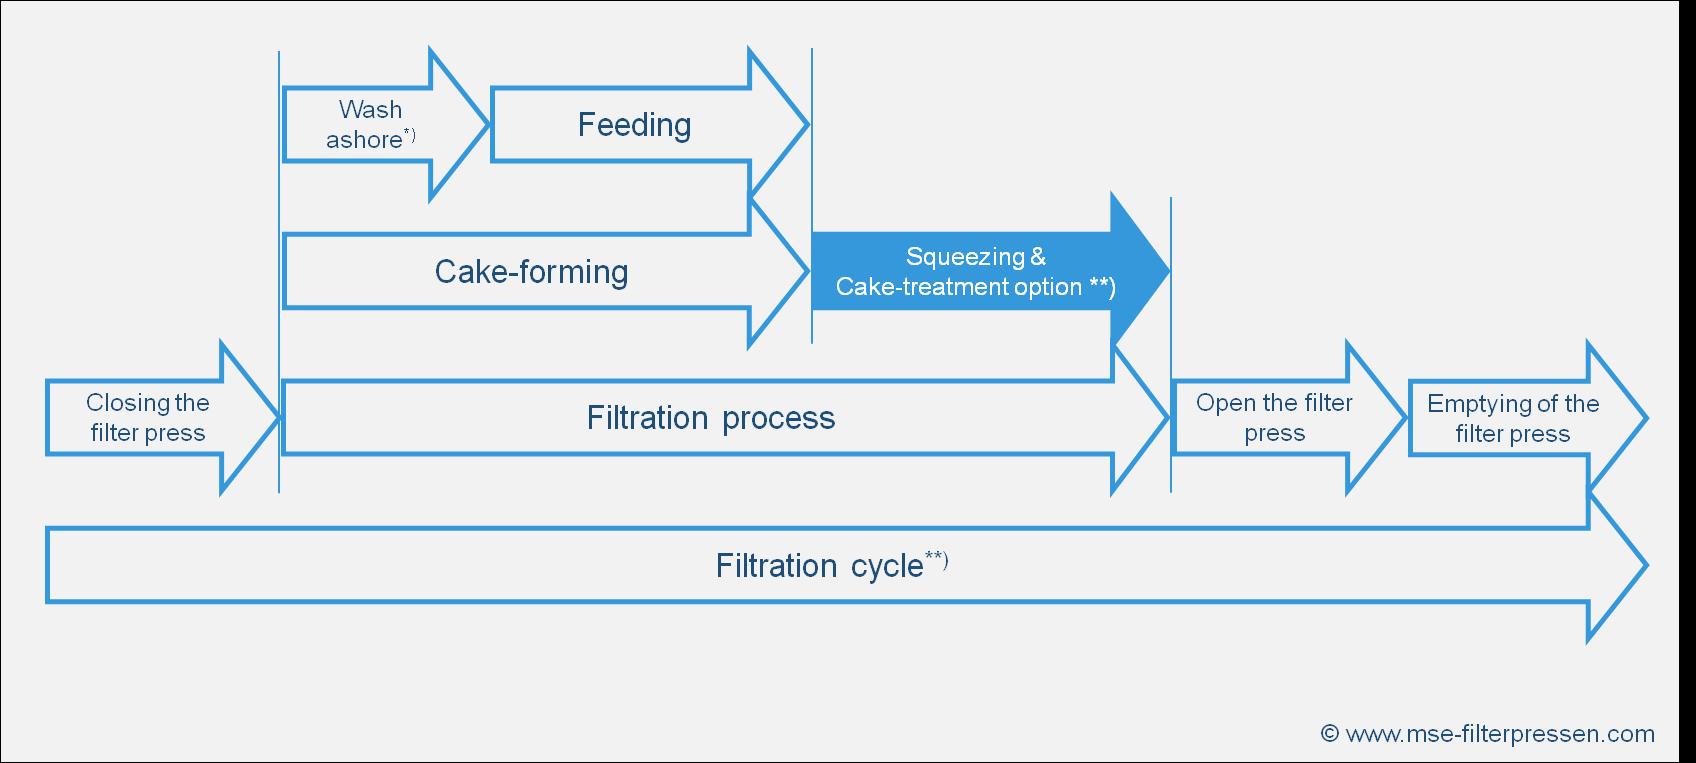 Filtration process of a membrane filter press